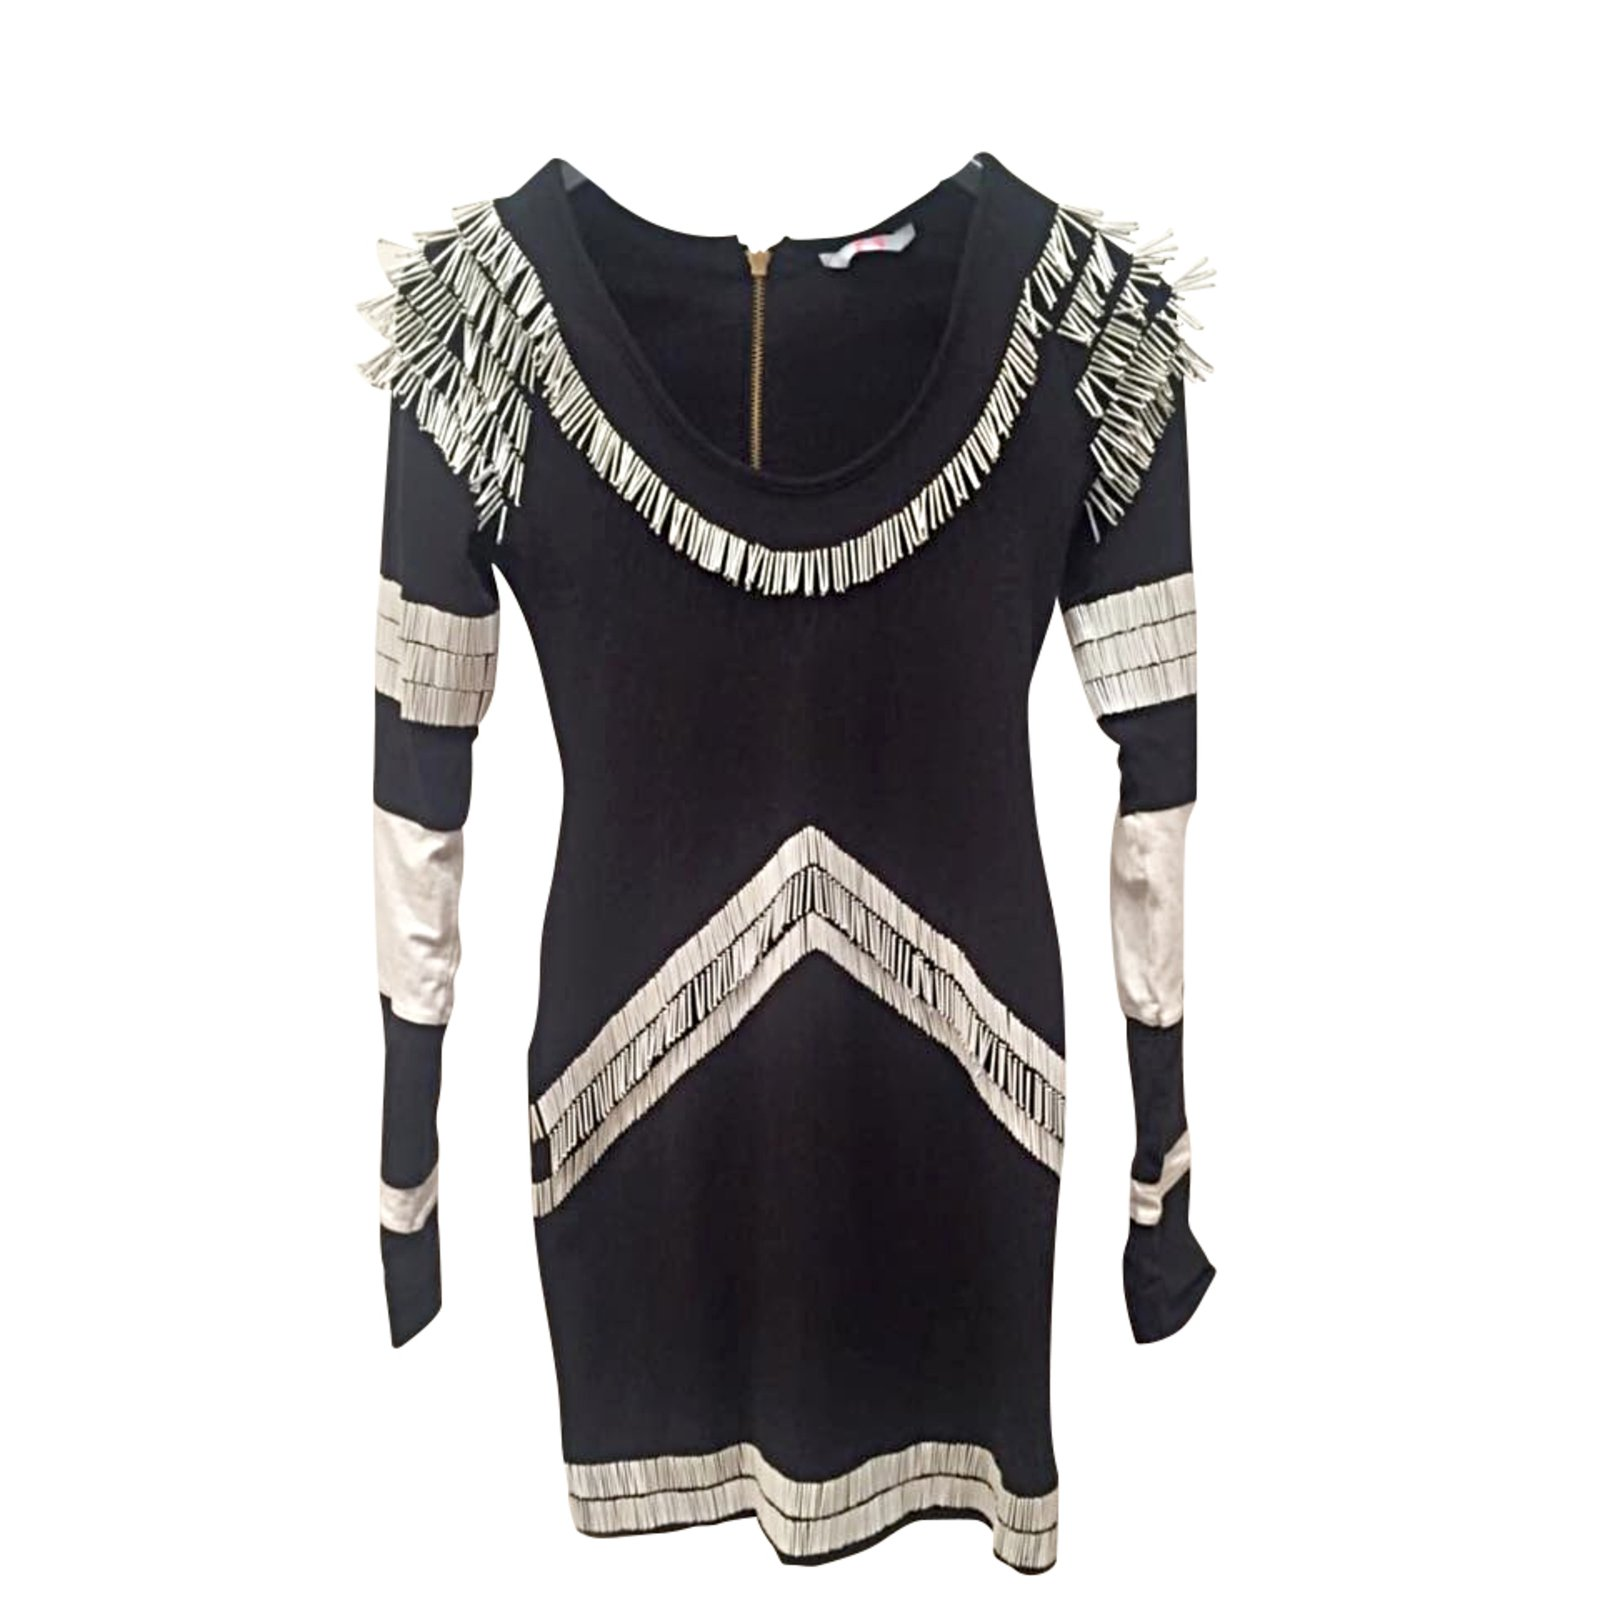 Sass Bide Dresses Dresses Cotton Elastane Black Ref 105289 Joli Closet